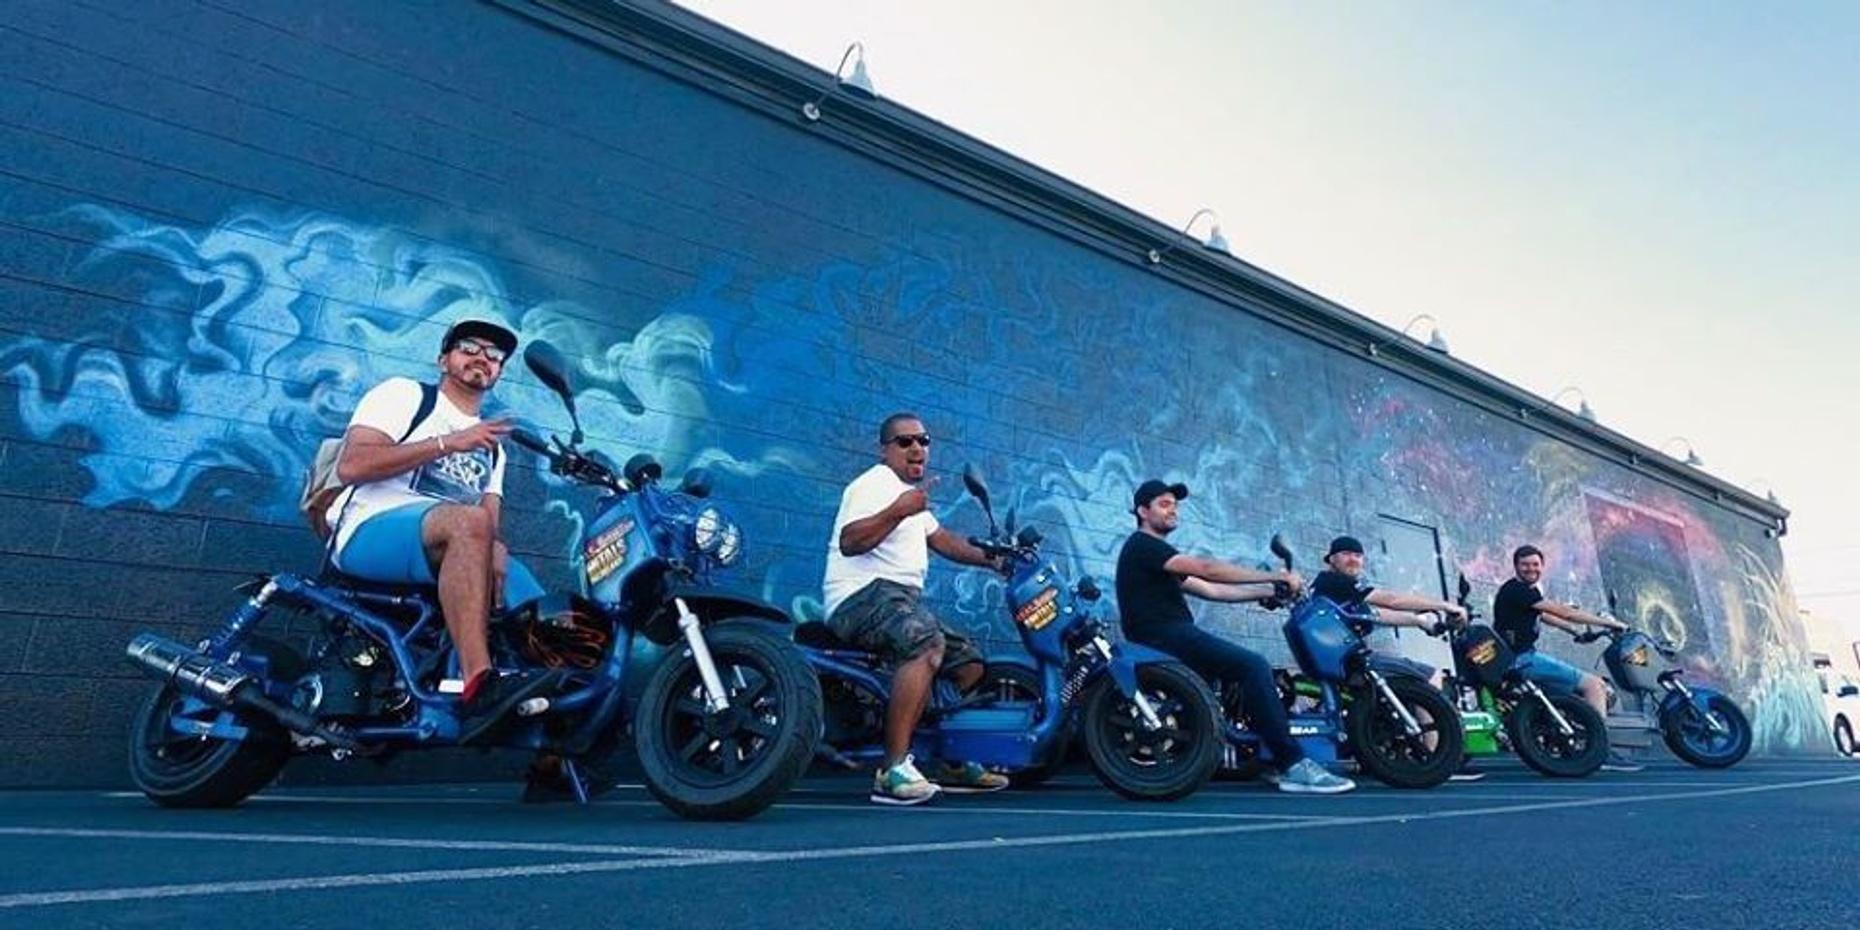 Full-Day Maddog 49cc Rental in Las Vegas